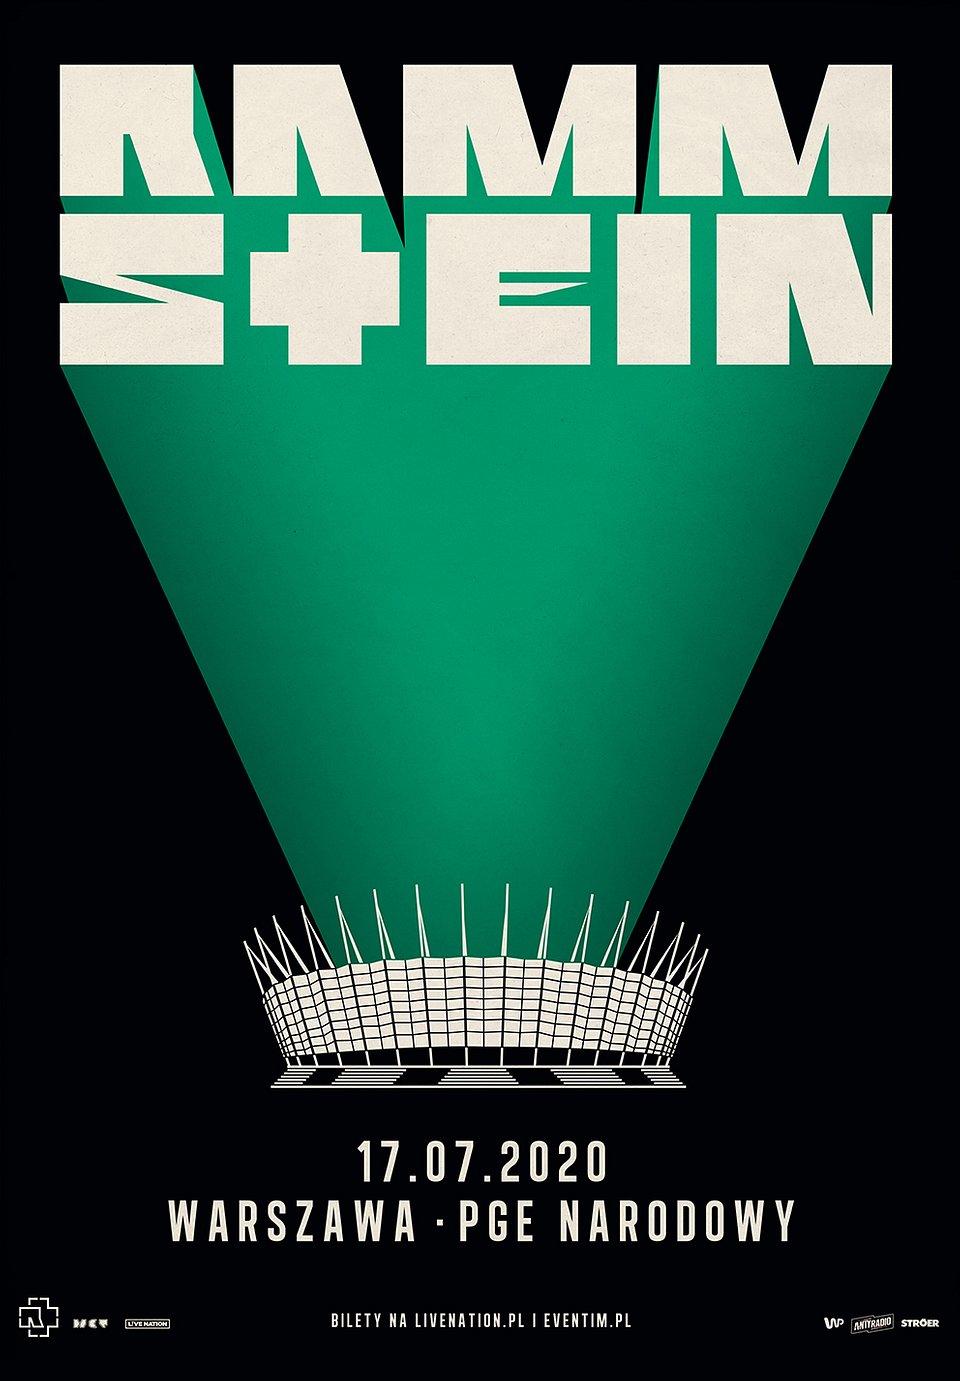 PL_Rammstein_2020_poster.jpg